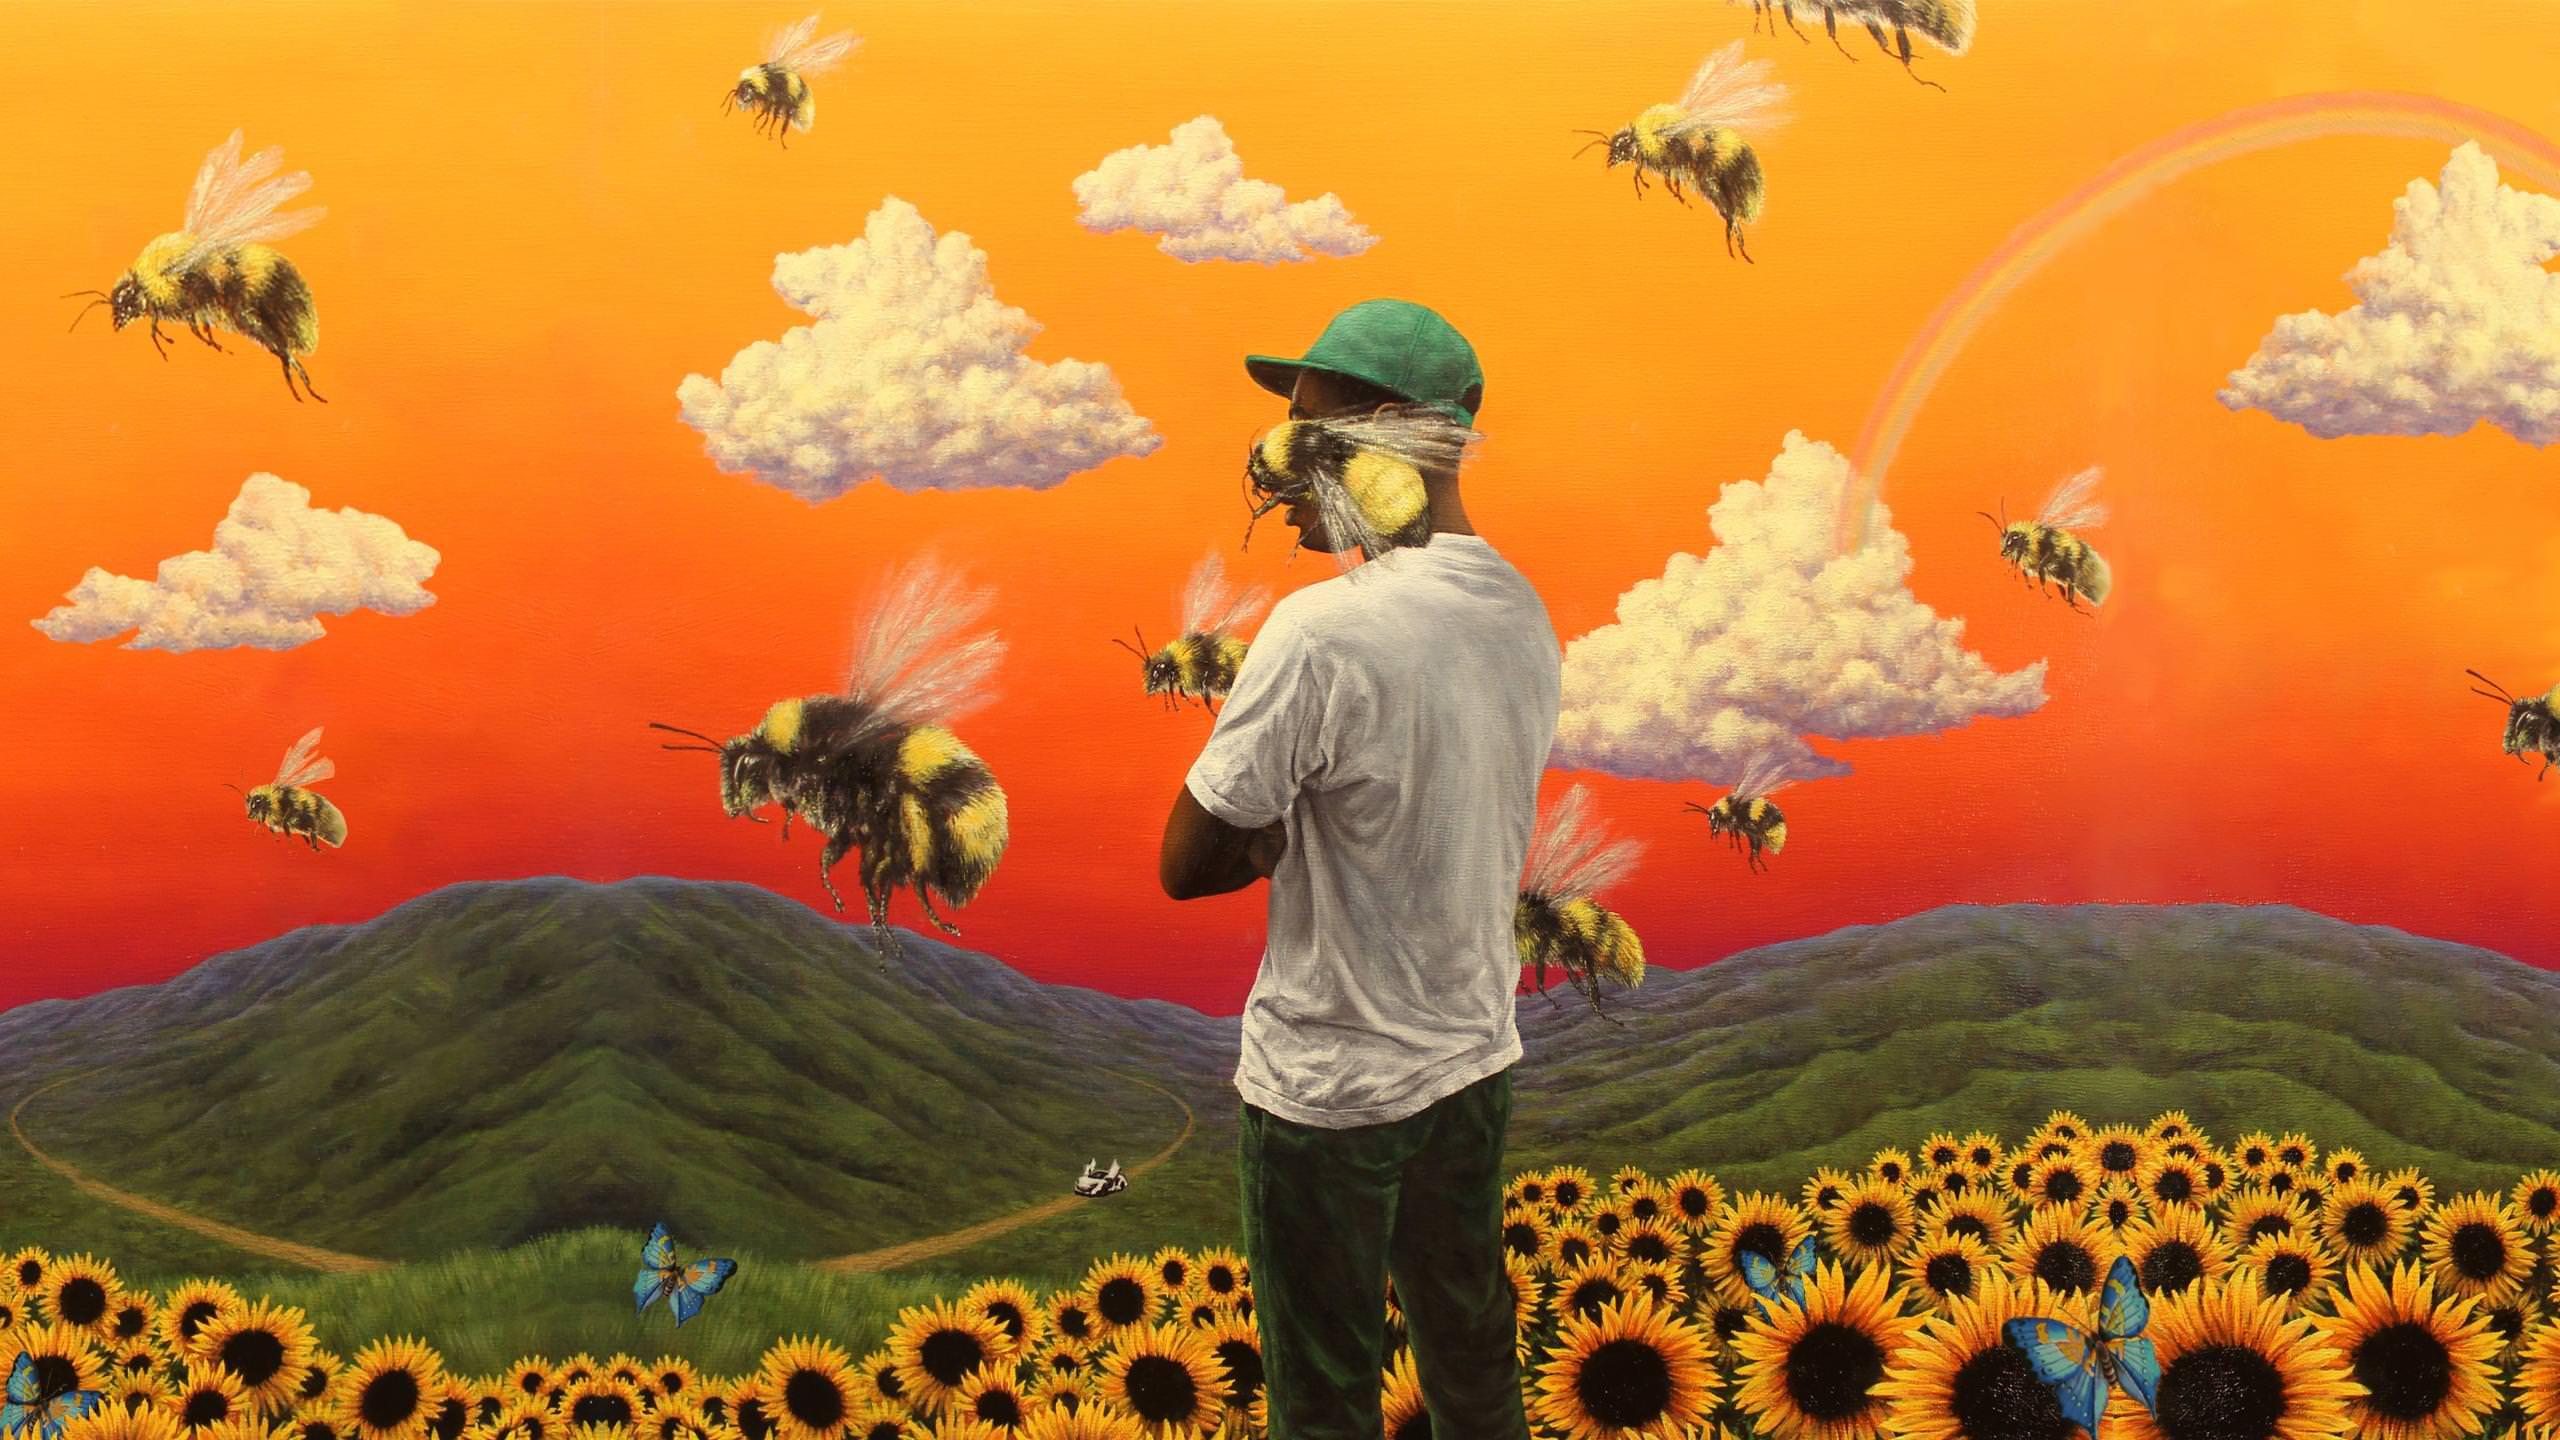 Top Wallpaper Ideas – Flower Boy Wallpaper Ideas for Boys' Rooms